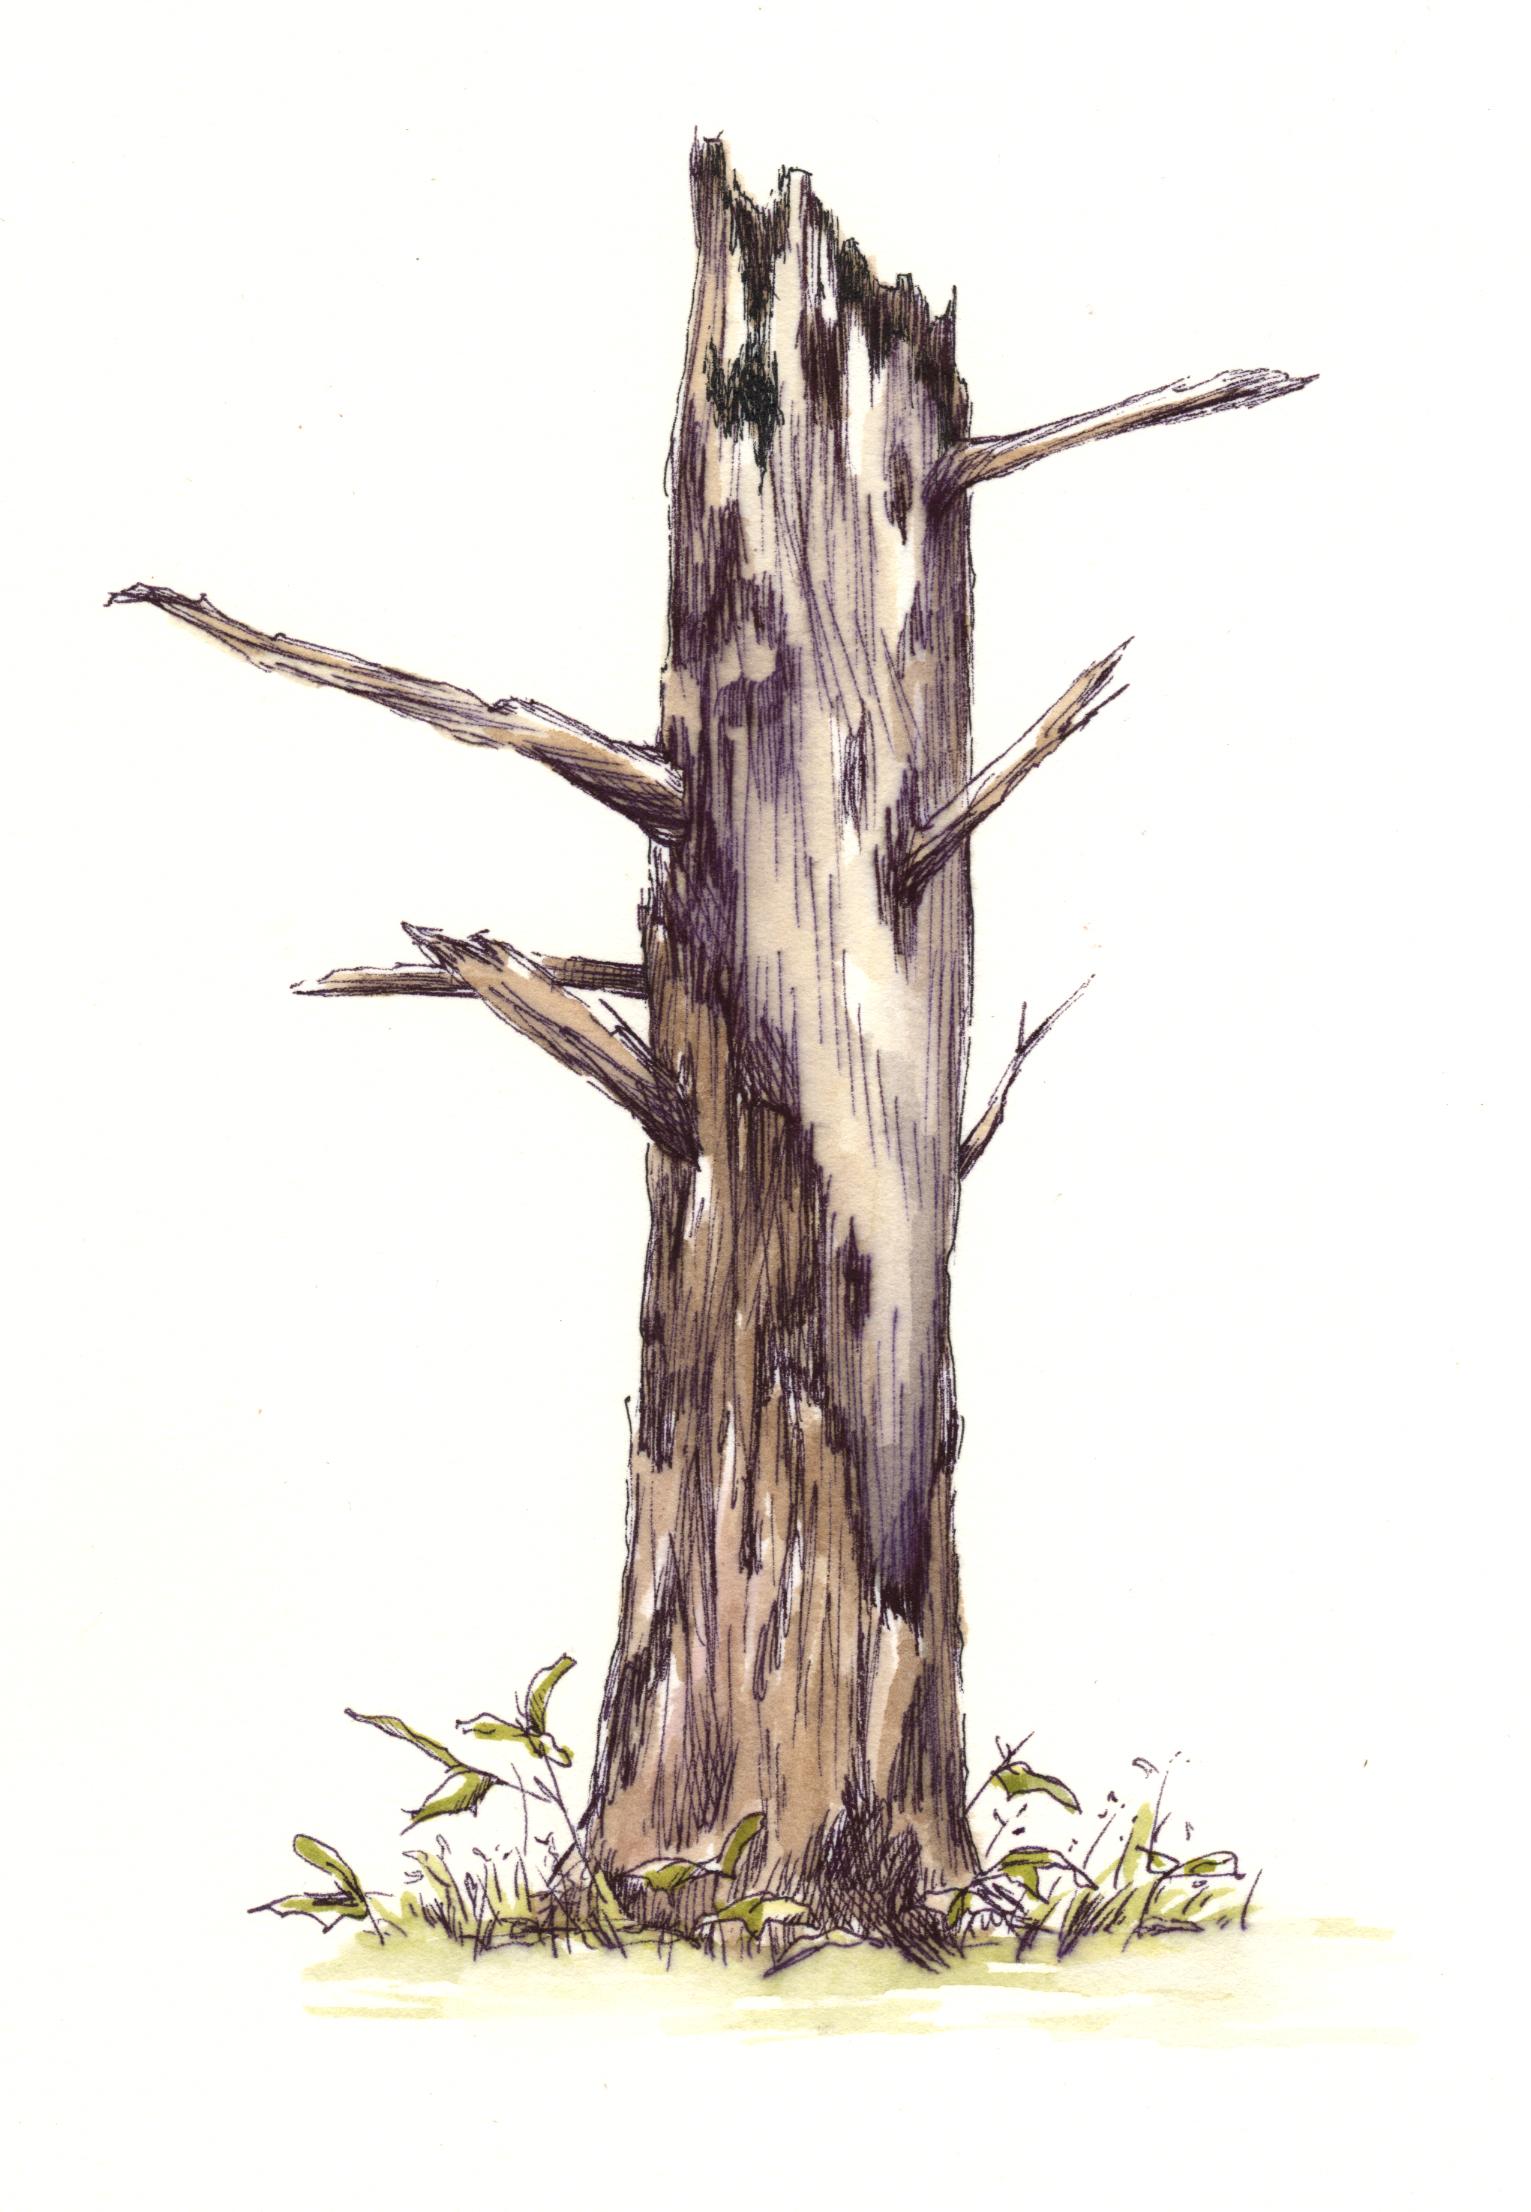 Snag Tree